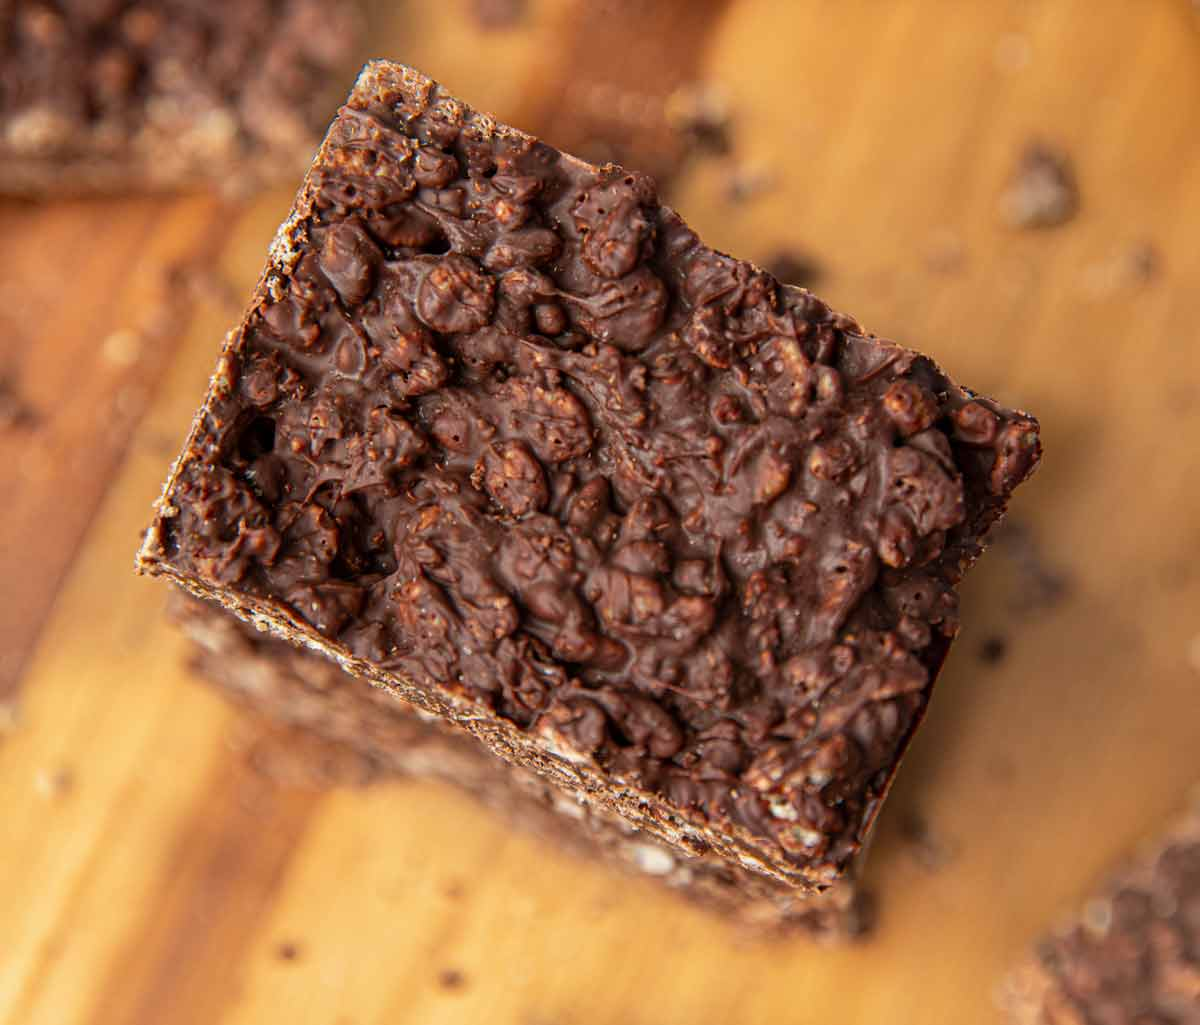 Piece of Chocolate Crunch Bar